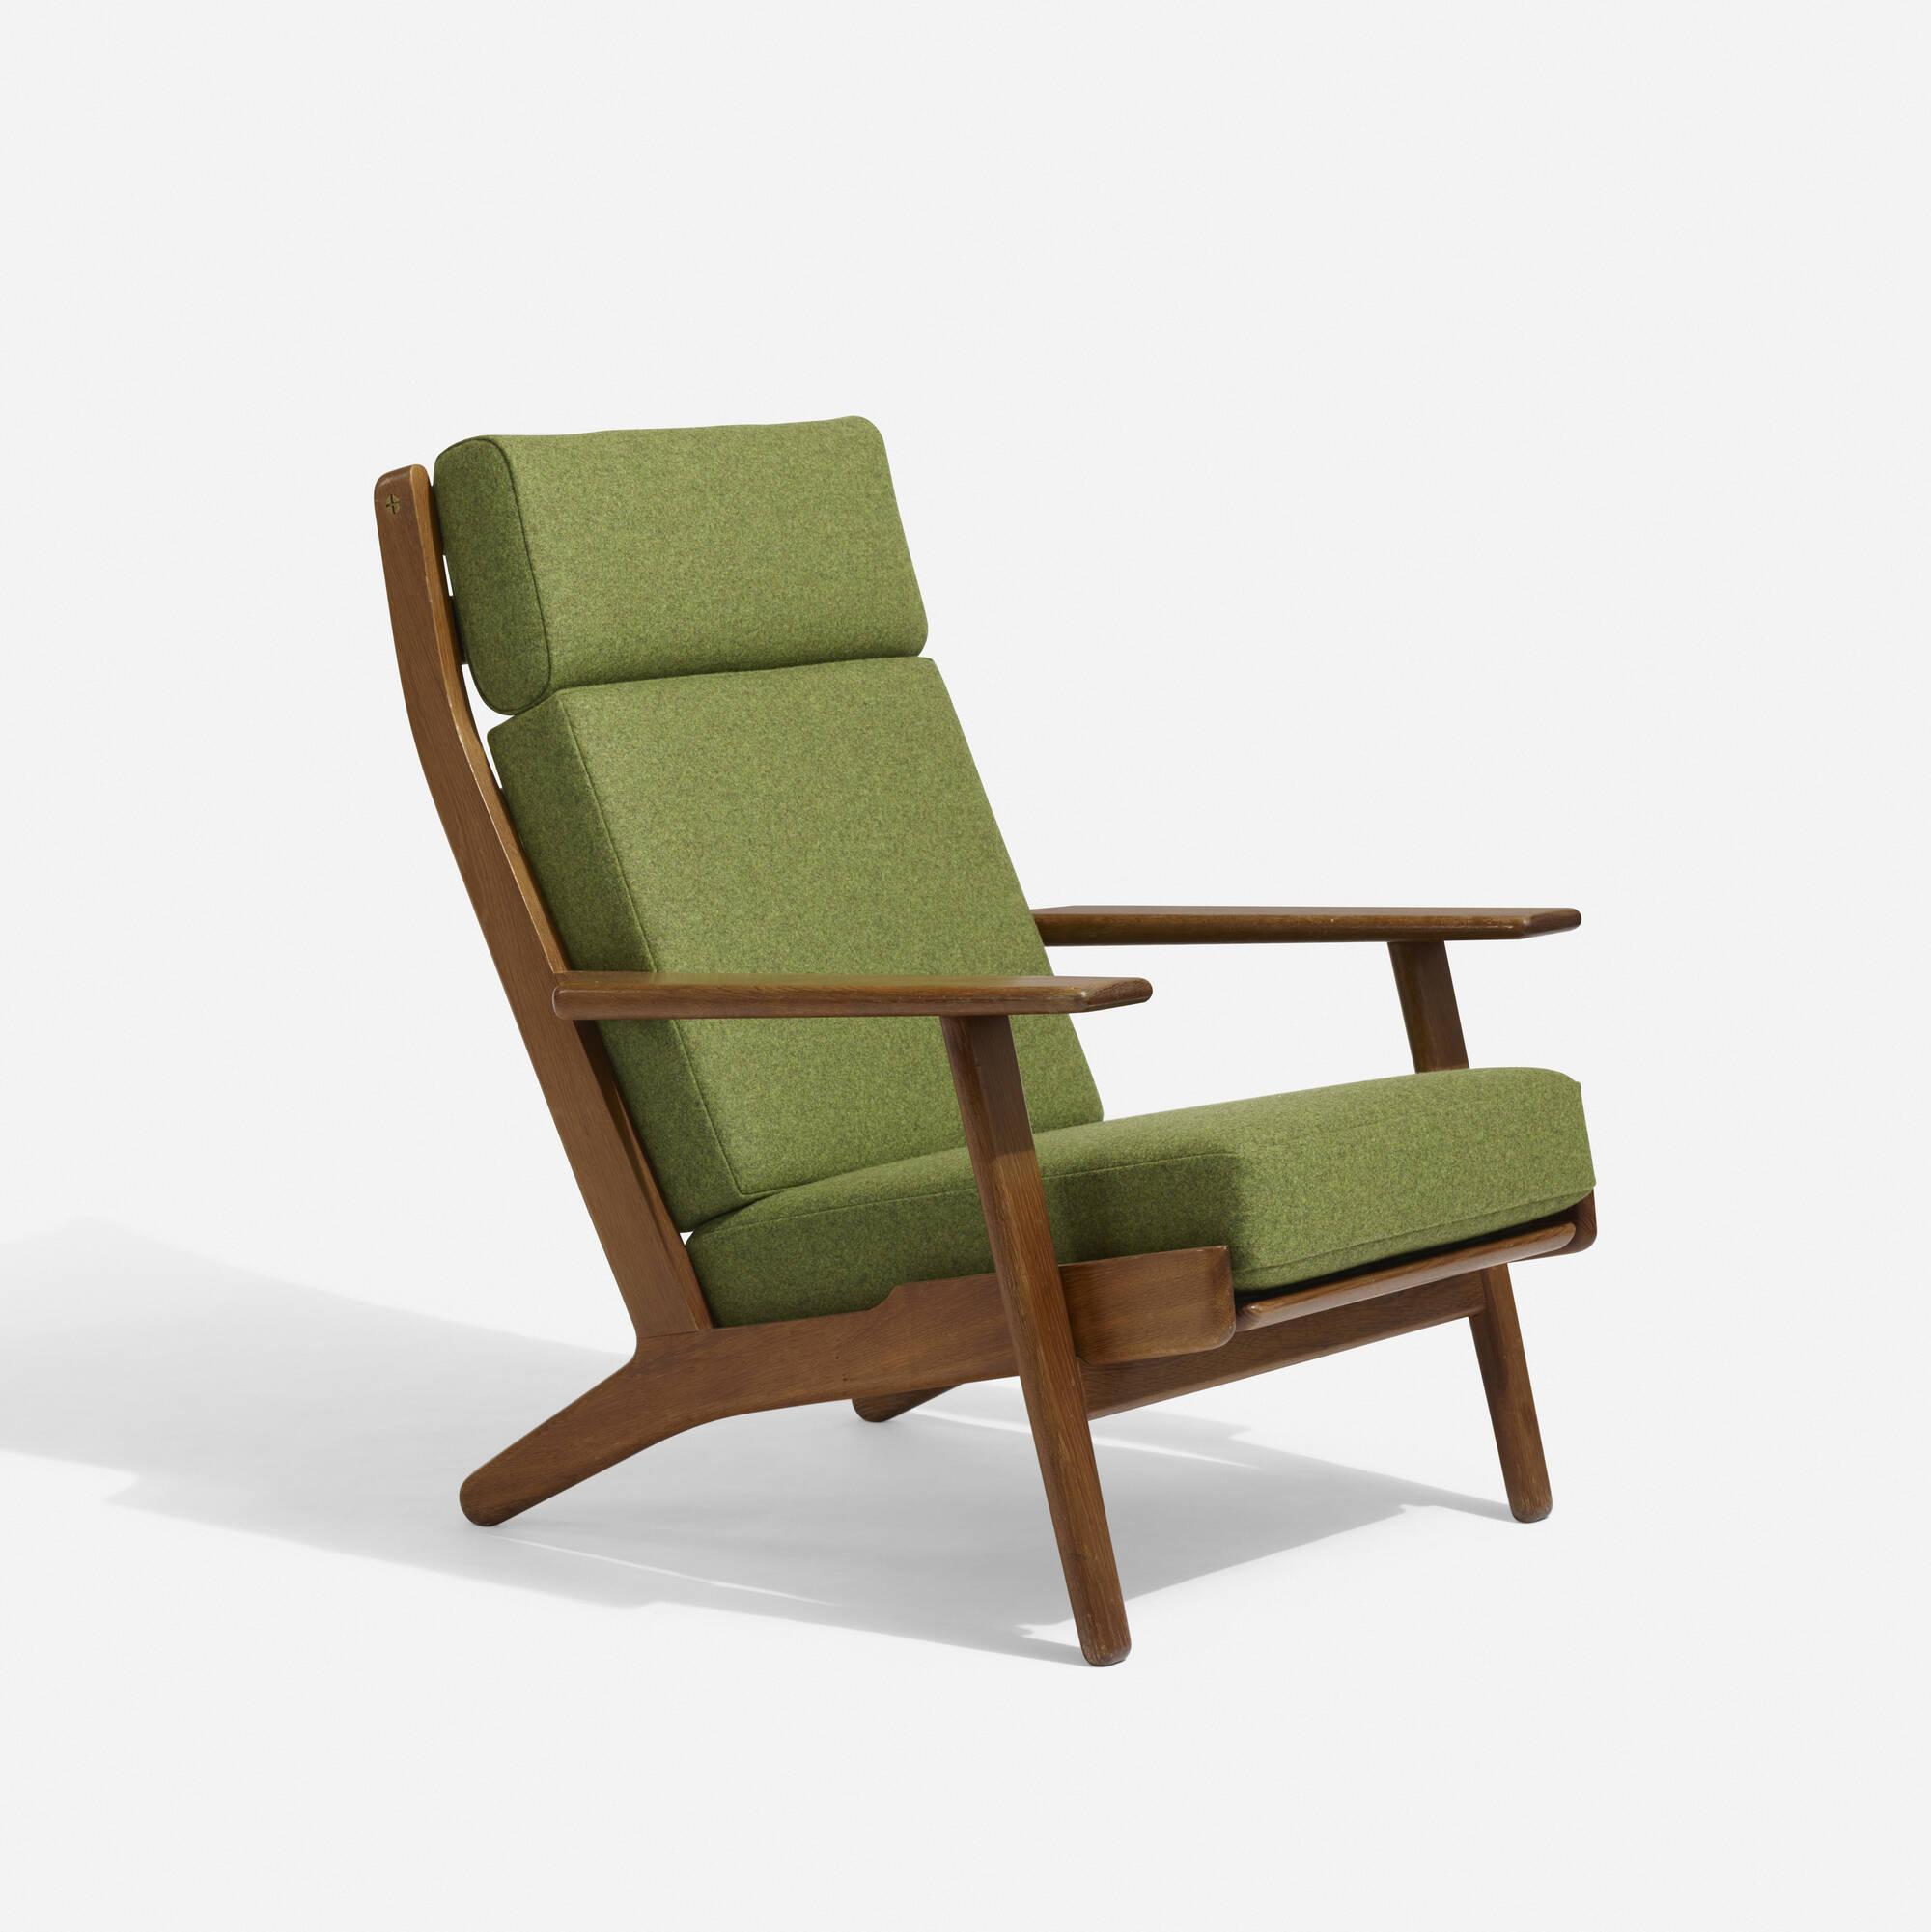 Superb 206: Hans J. Wegner / Lounge Chair, Model GE290 A (1